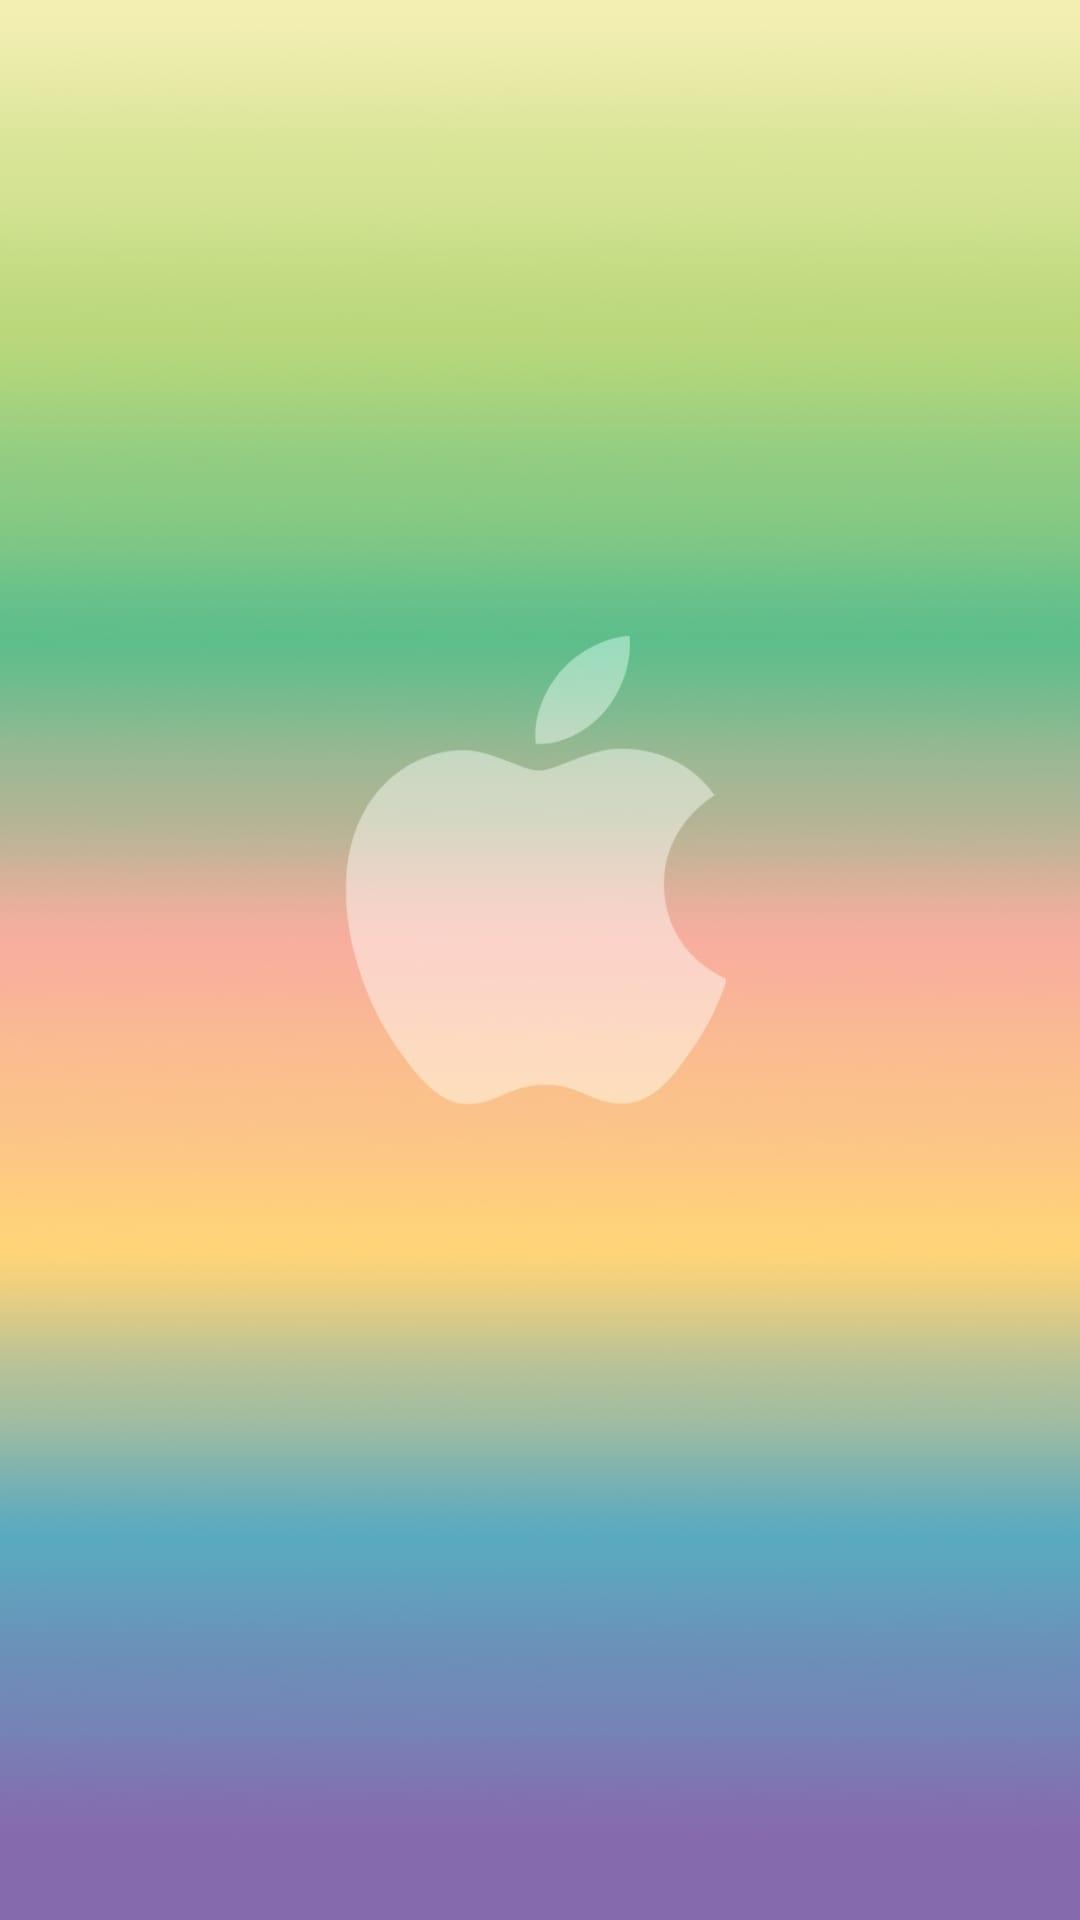 Fondos de pantalla de apple para el iphone for Imagenes d fondo de pantalla para celular